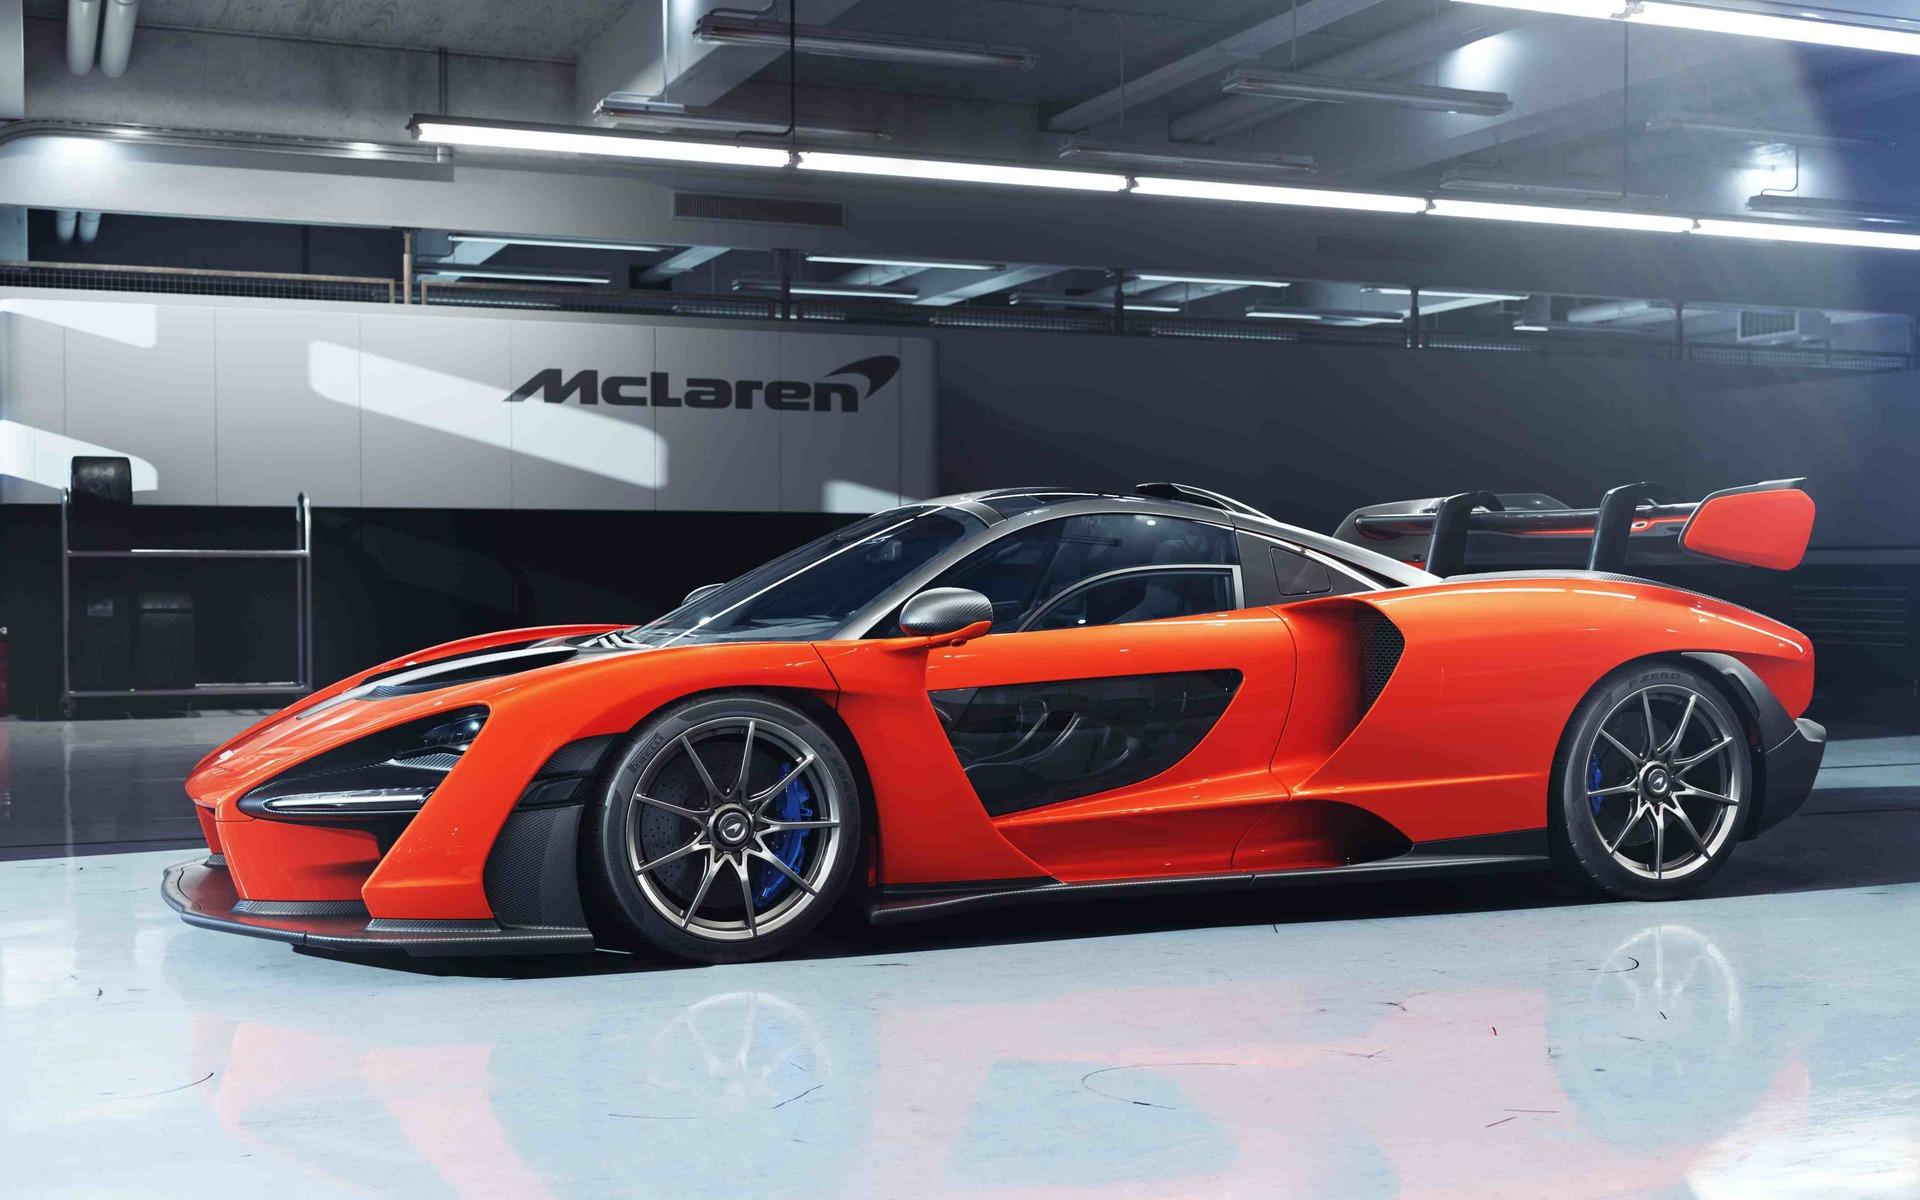 McLaren Senna: The Latest Hypercar